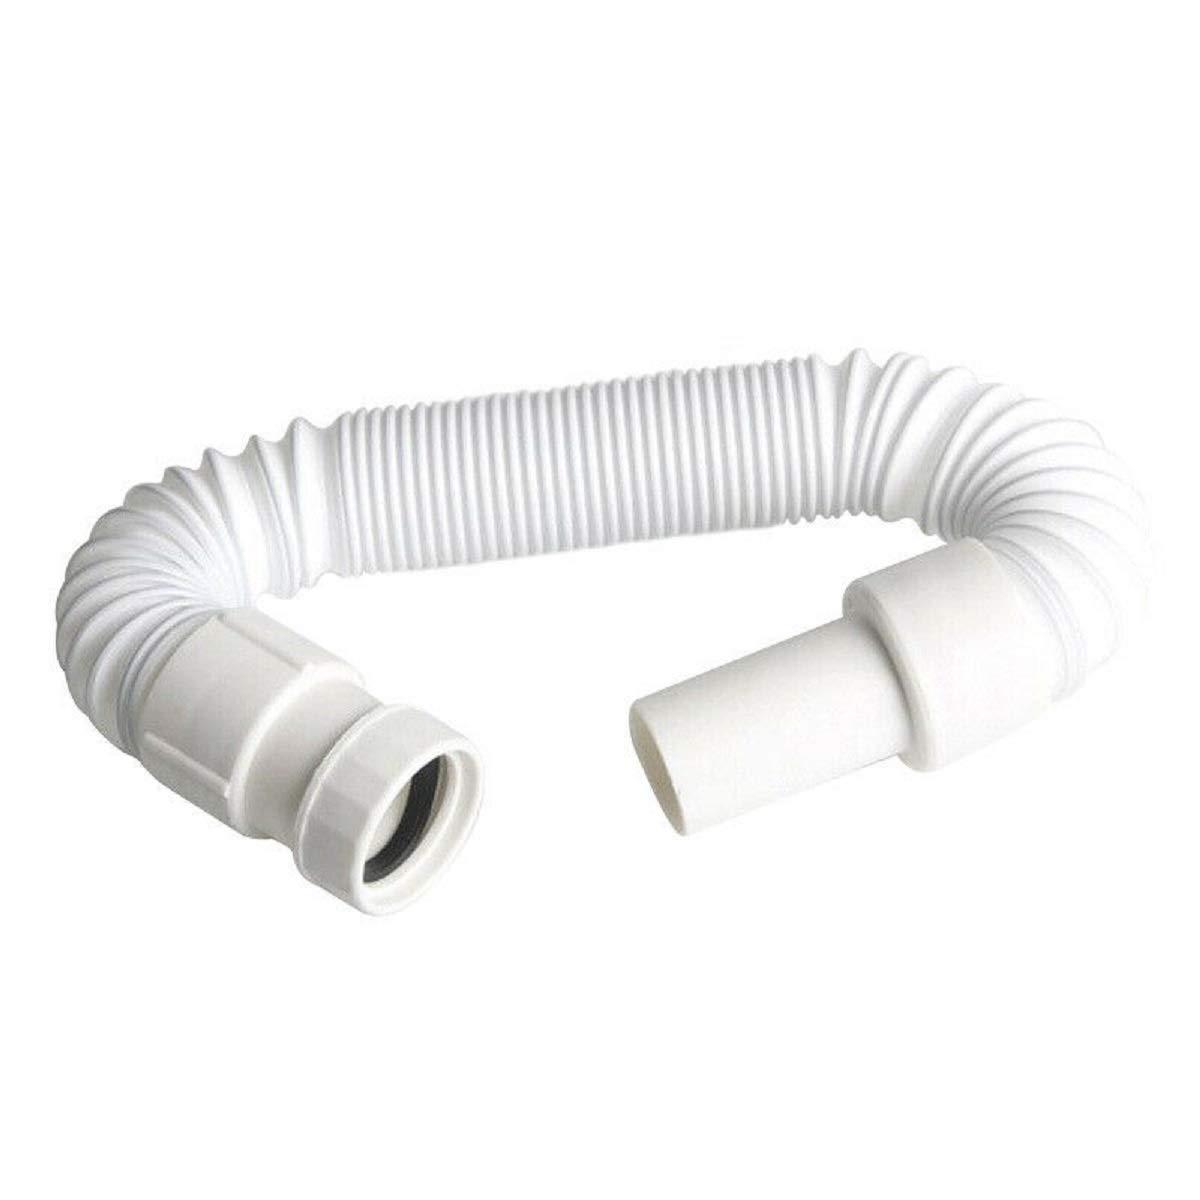 Bathroom Sink Flexible 36-80cm Pipe Sink Basin Water Drain Hose Tube Kitchen